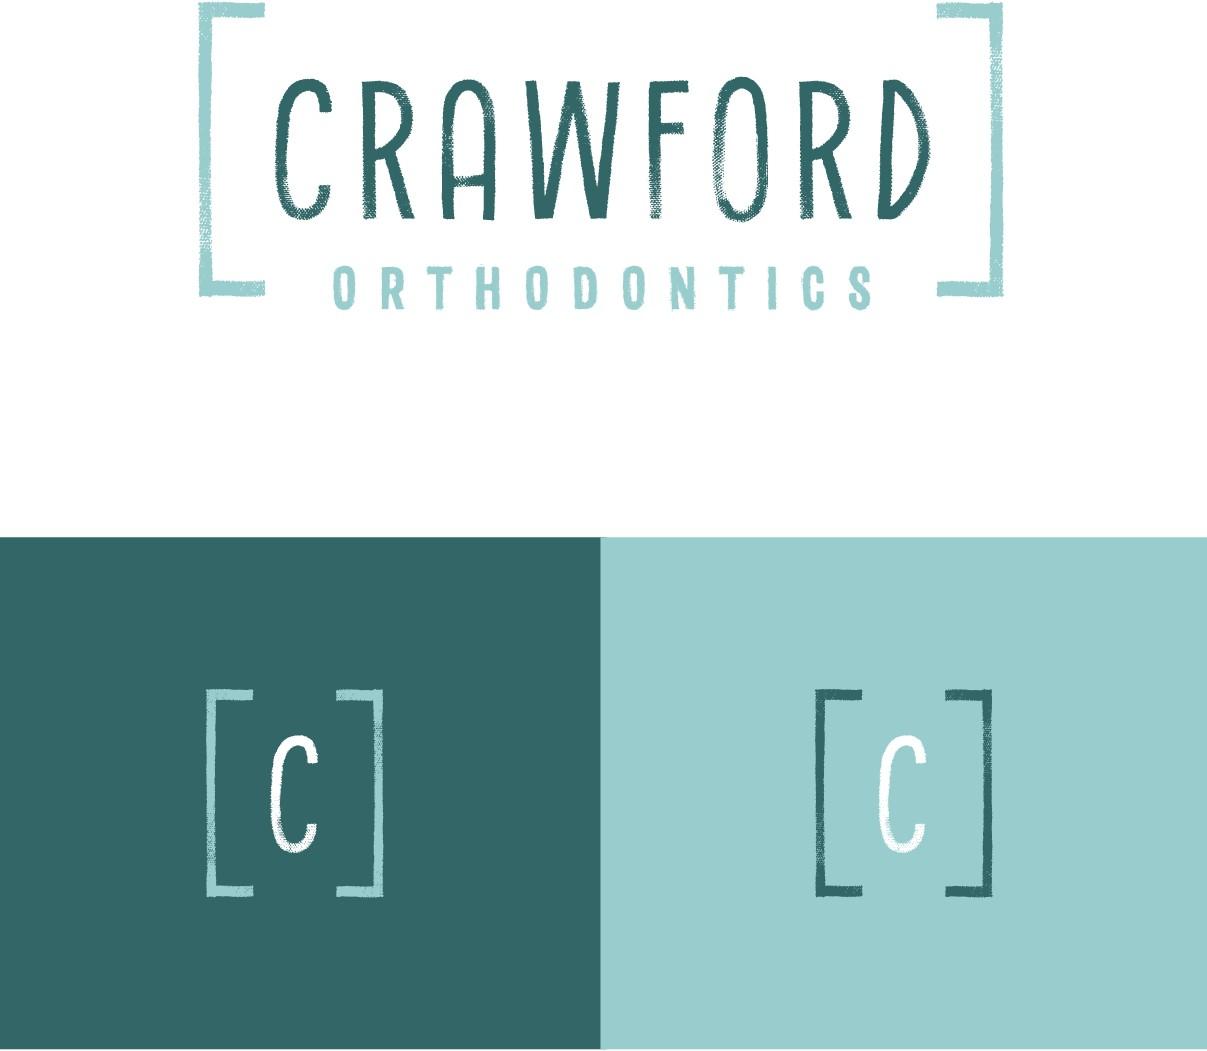 Crawford Orthodontics